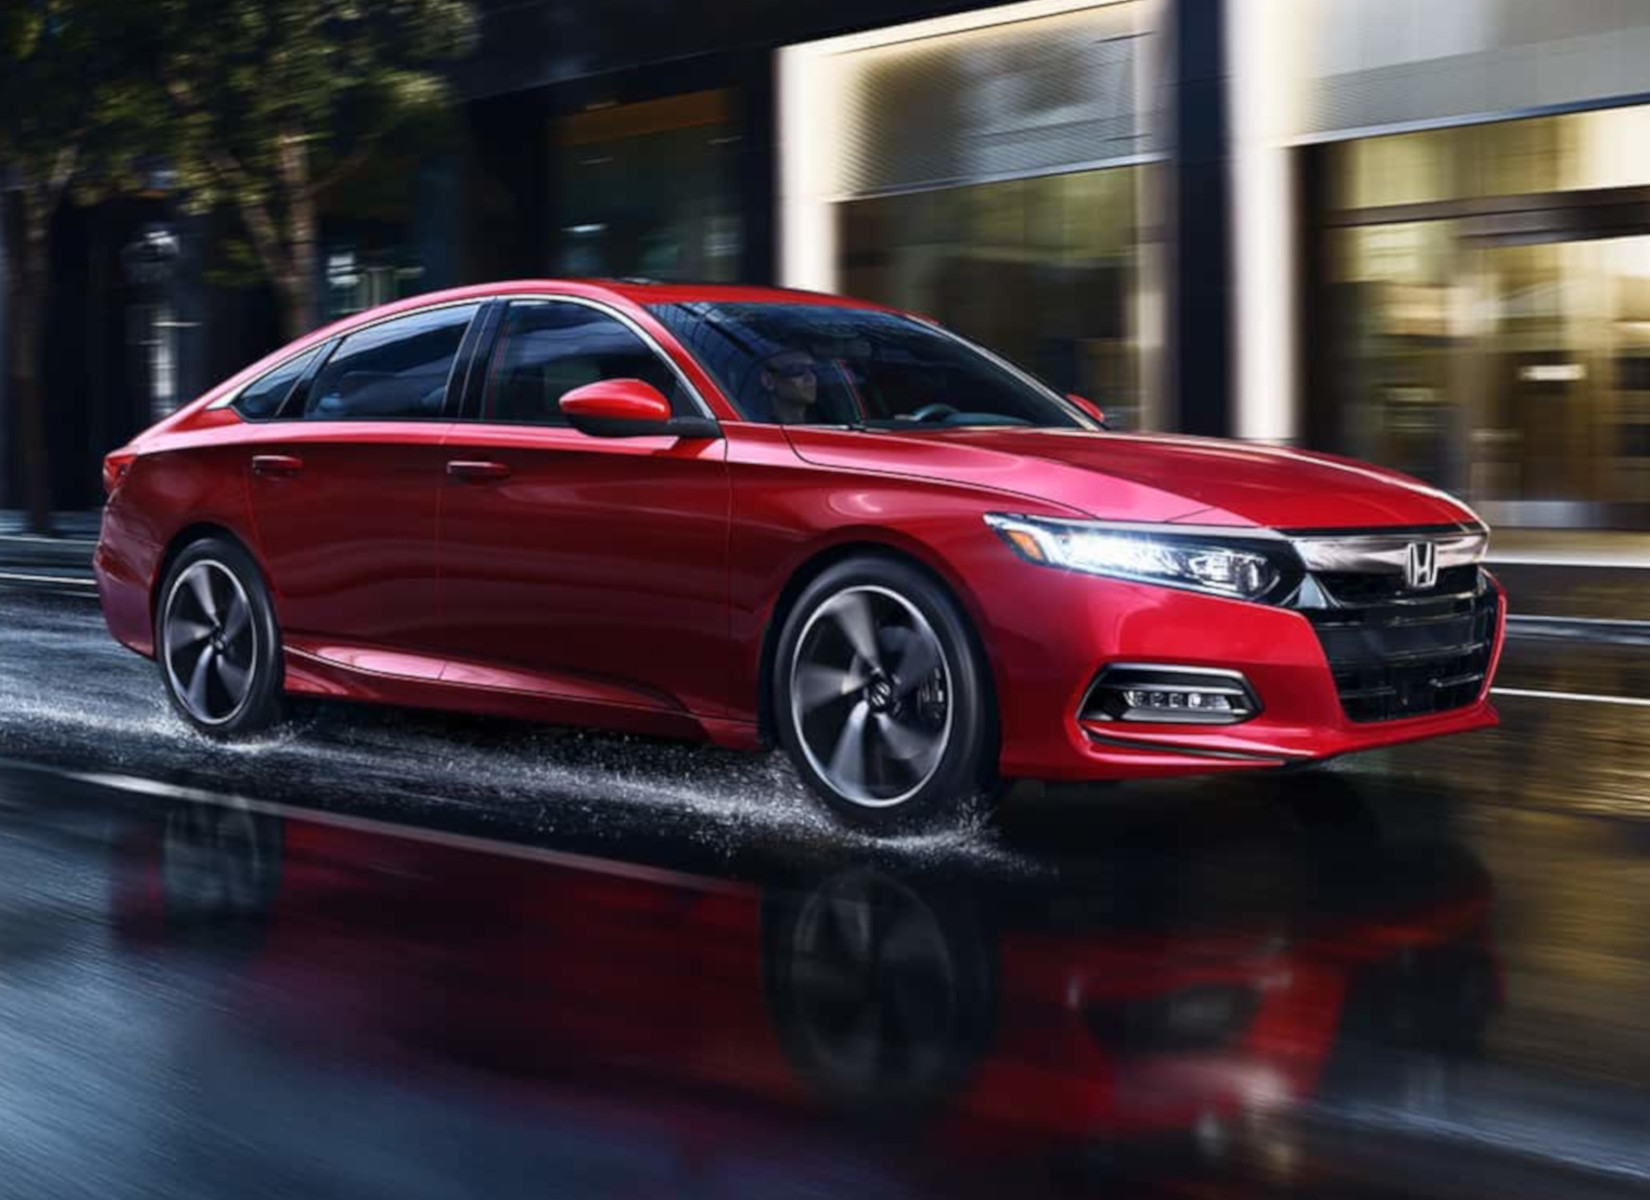 The high-performance 2019 Honda Accord